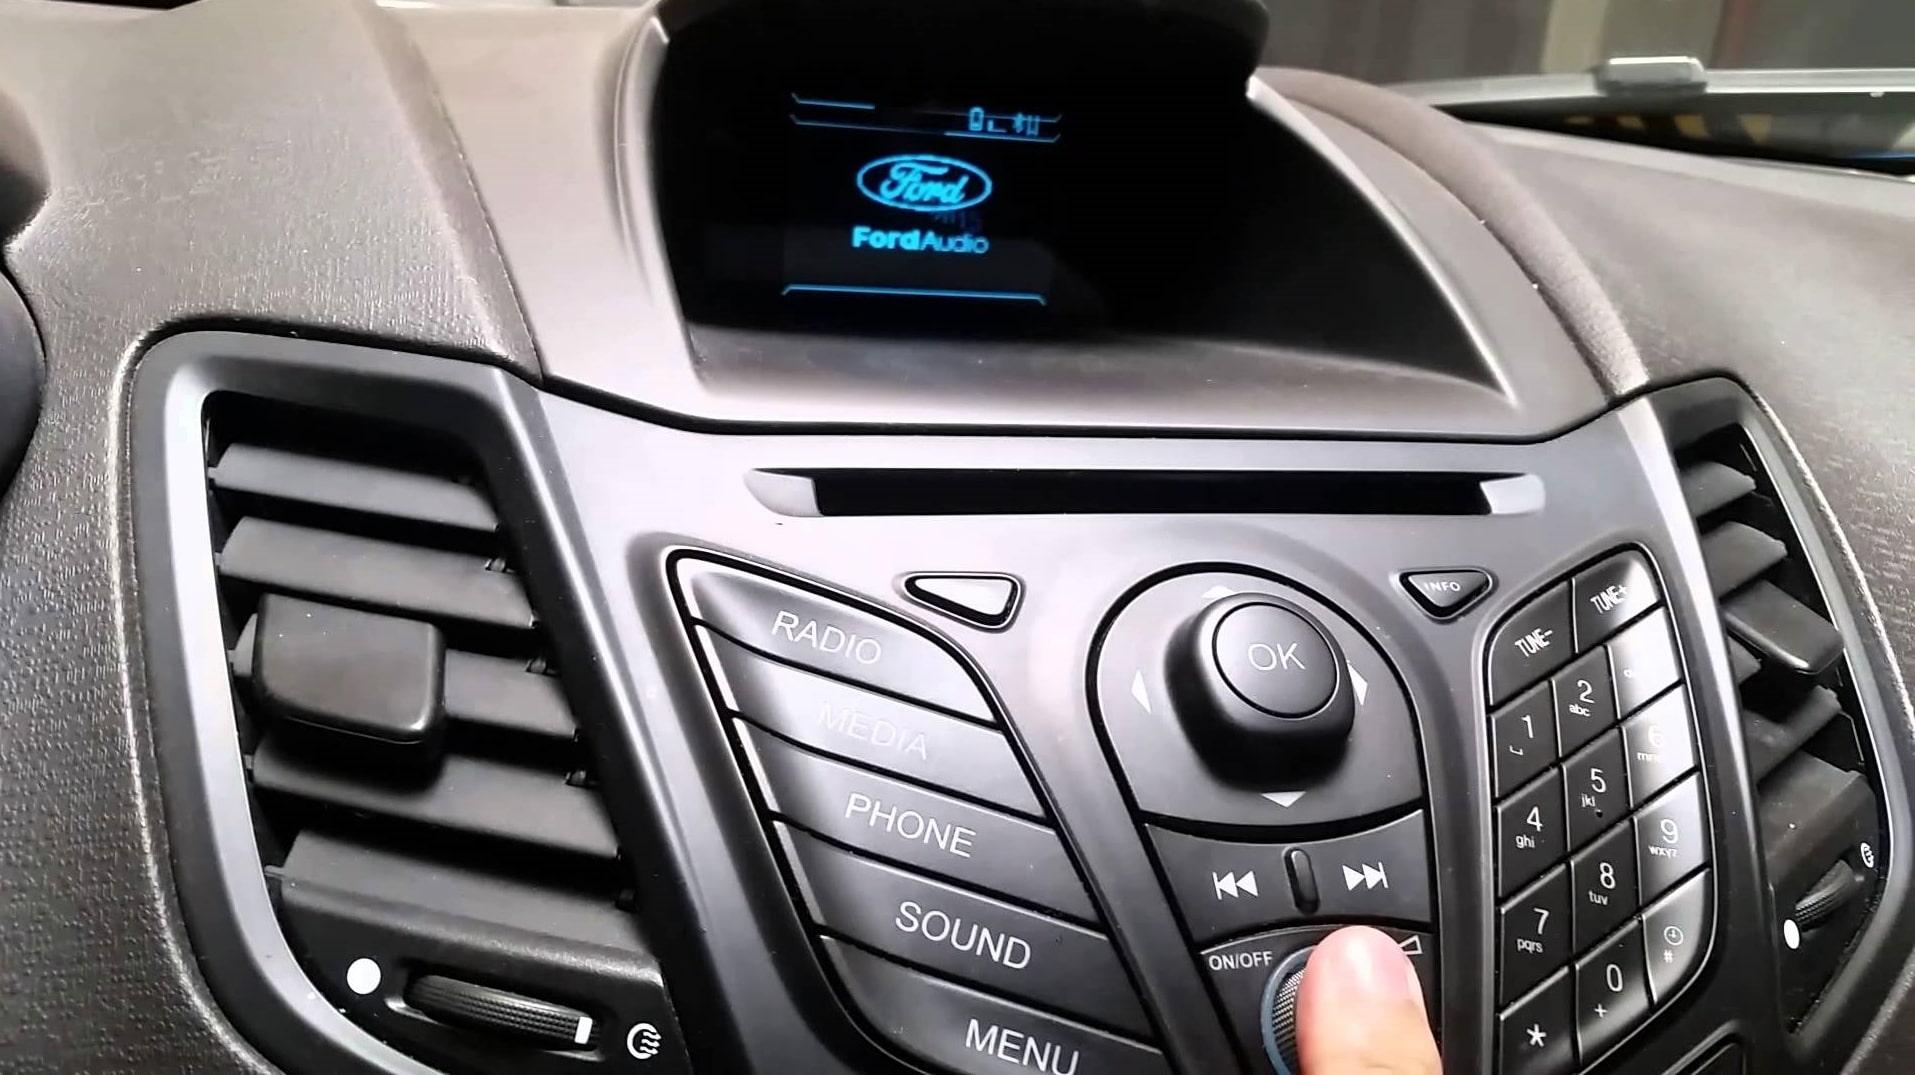 Ford Fiesta Radio Code